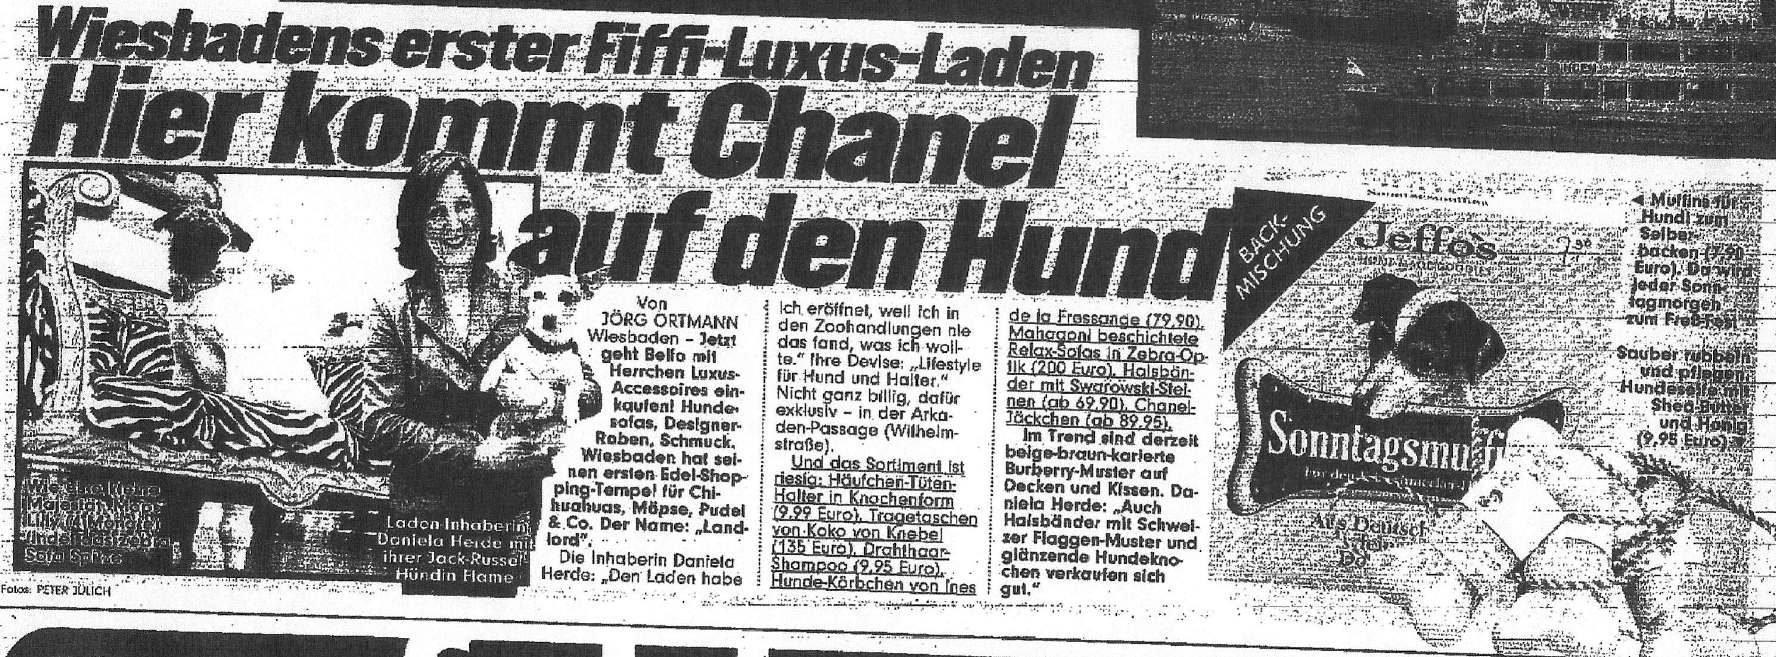 Presseschau Bild 6-2006